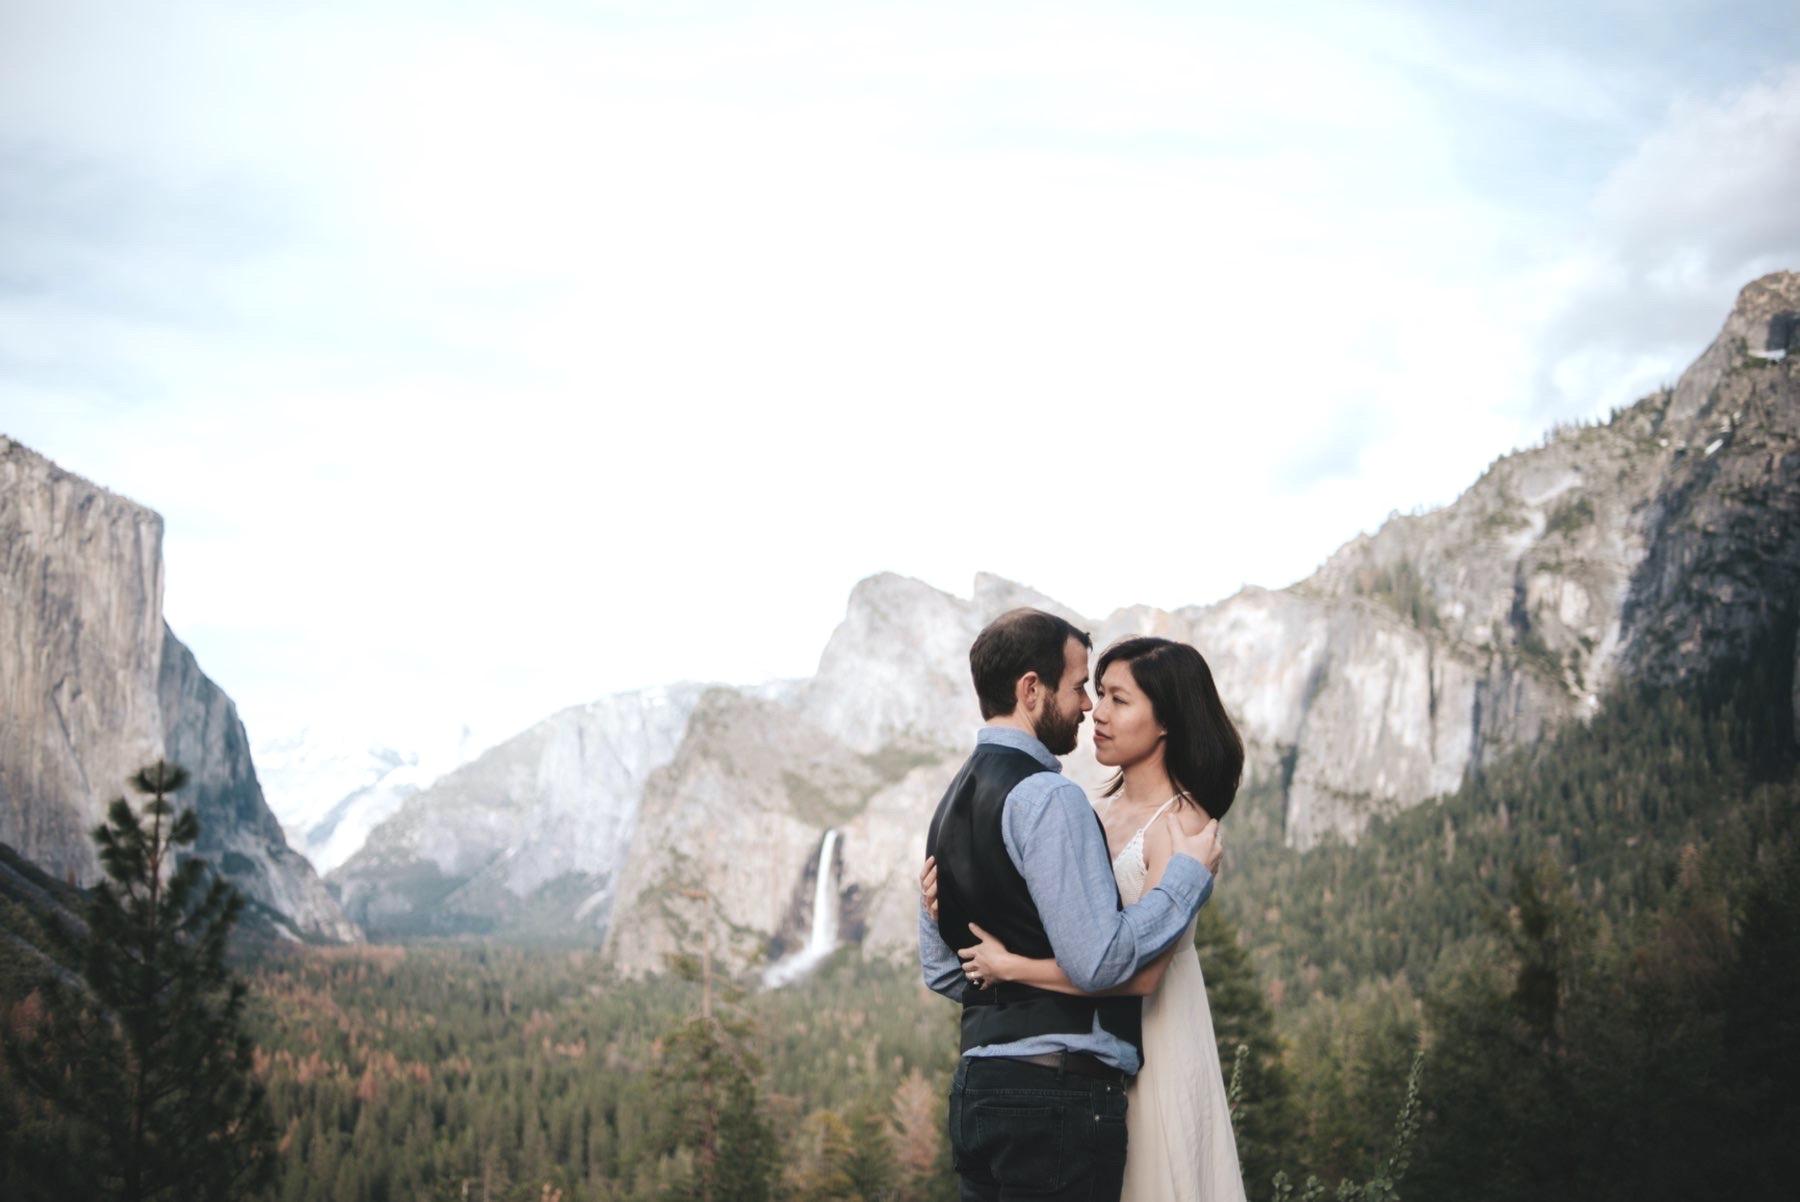 Get married in Yosemite National Park, California.